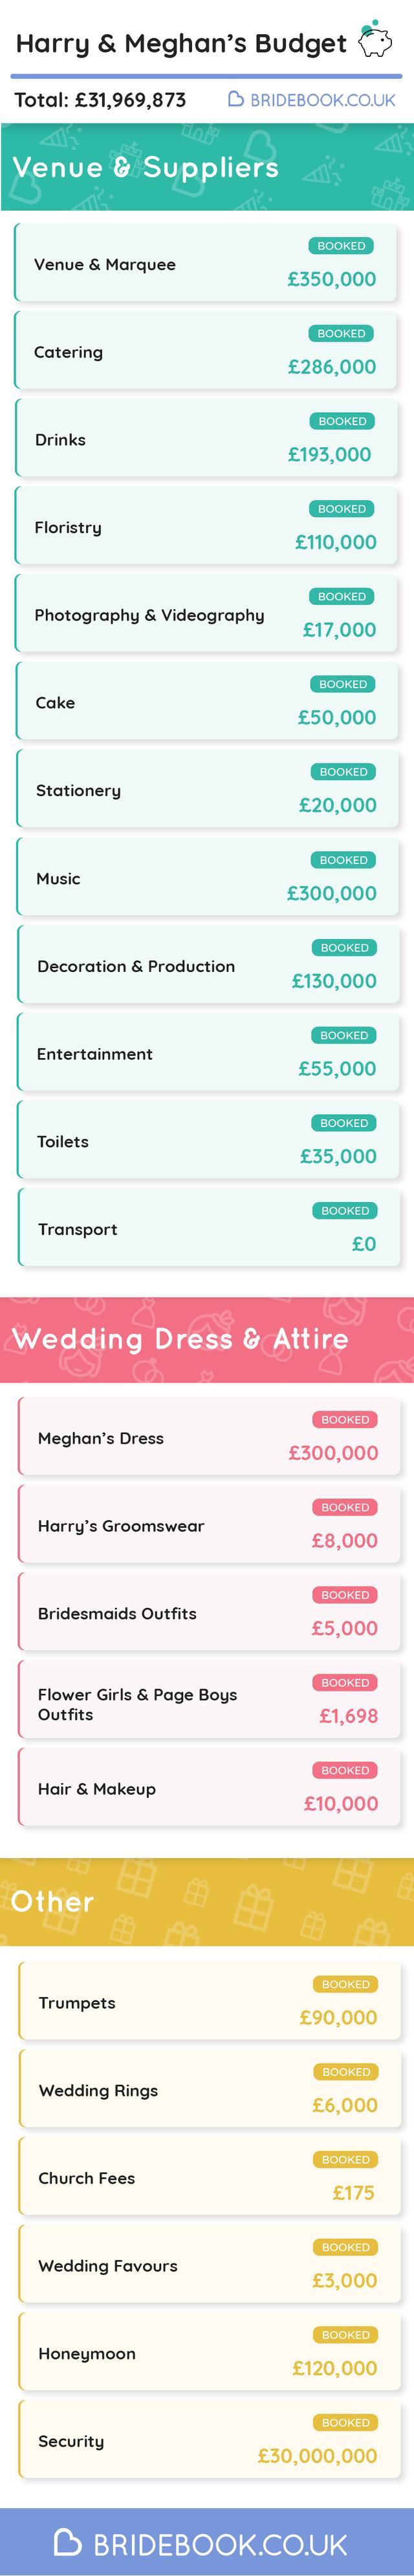 Royal wedding budget